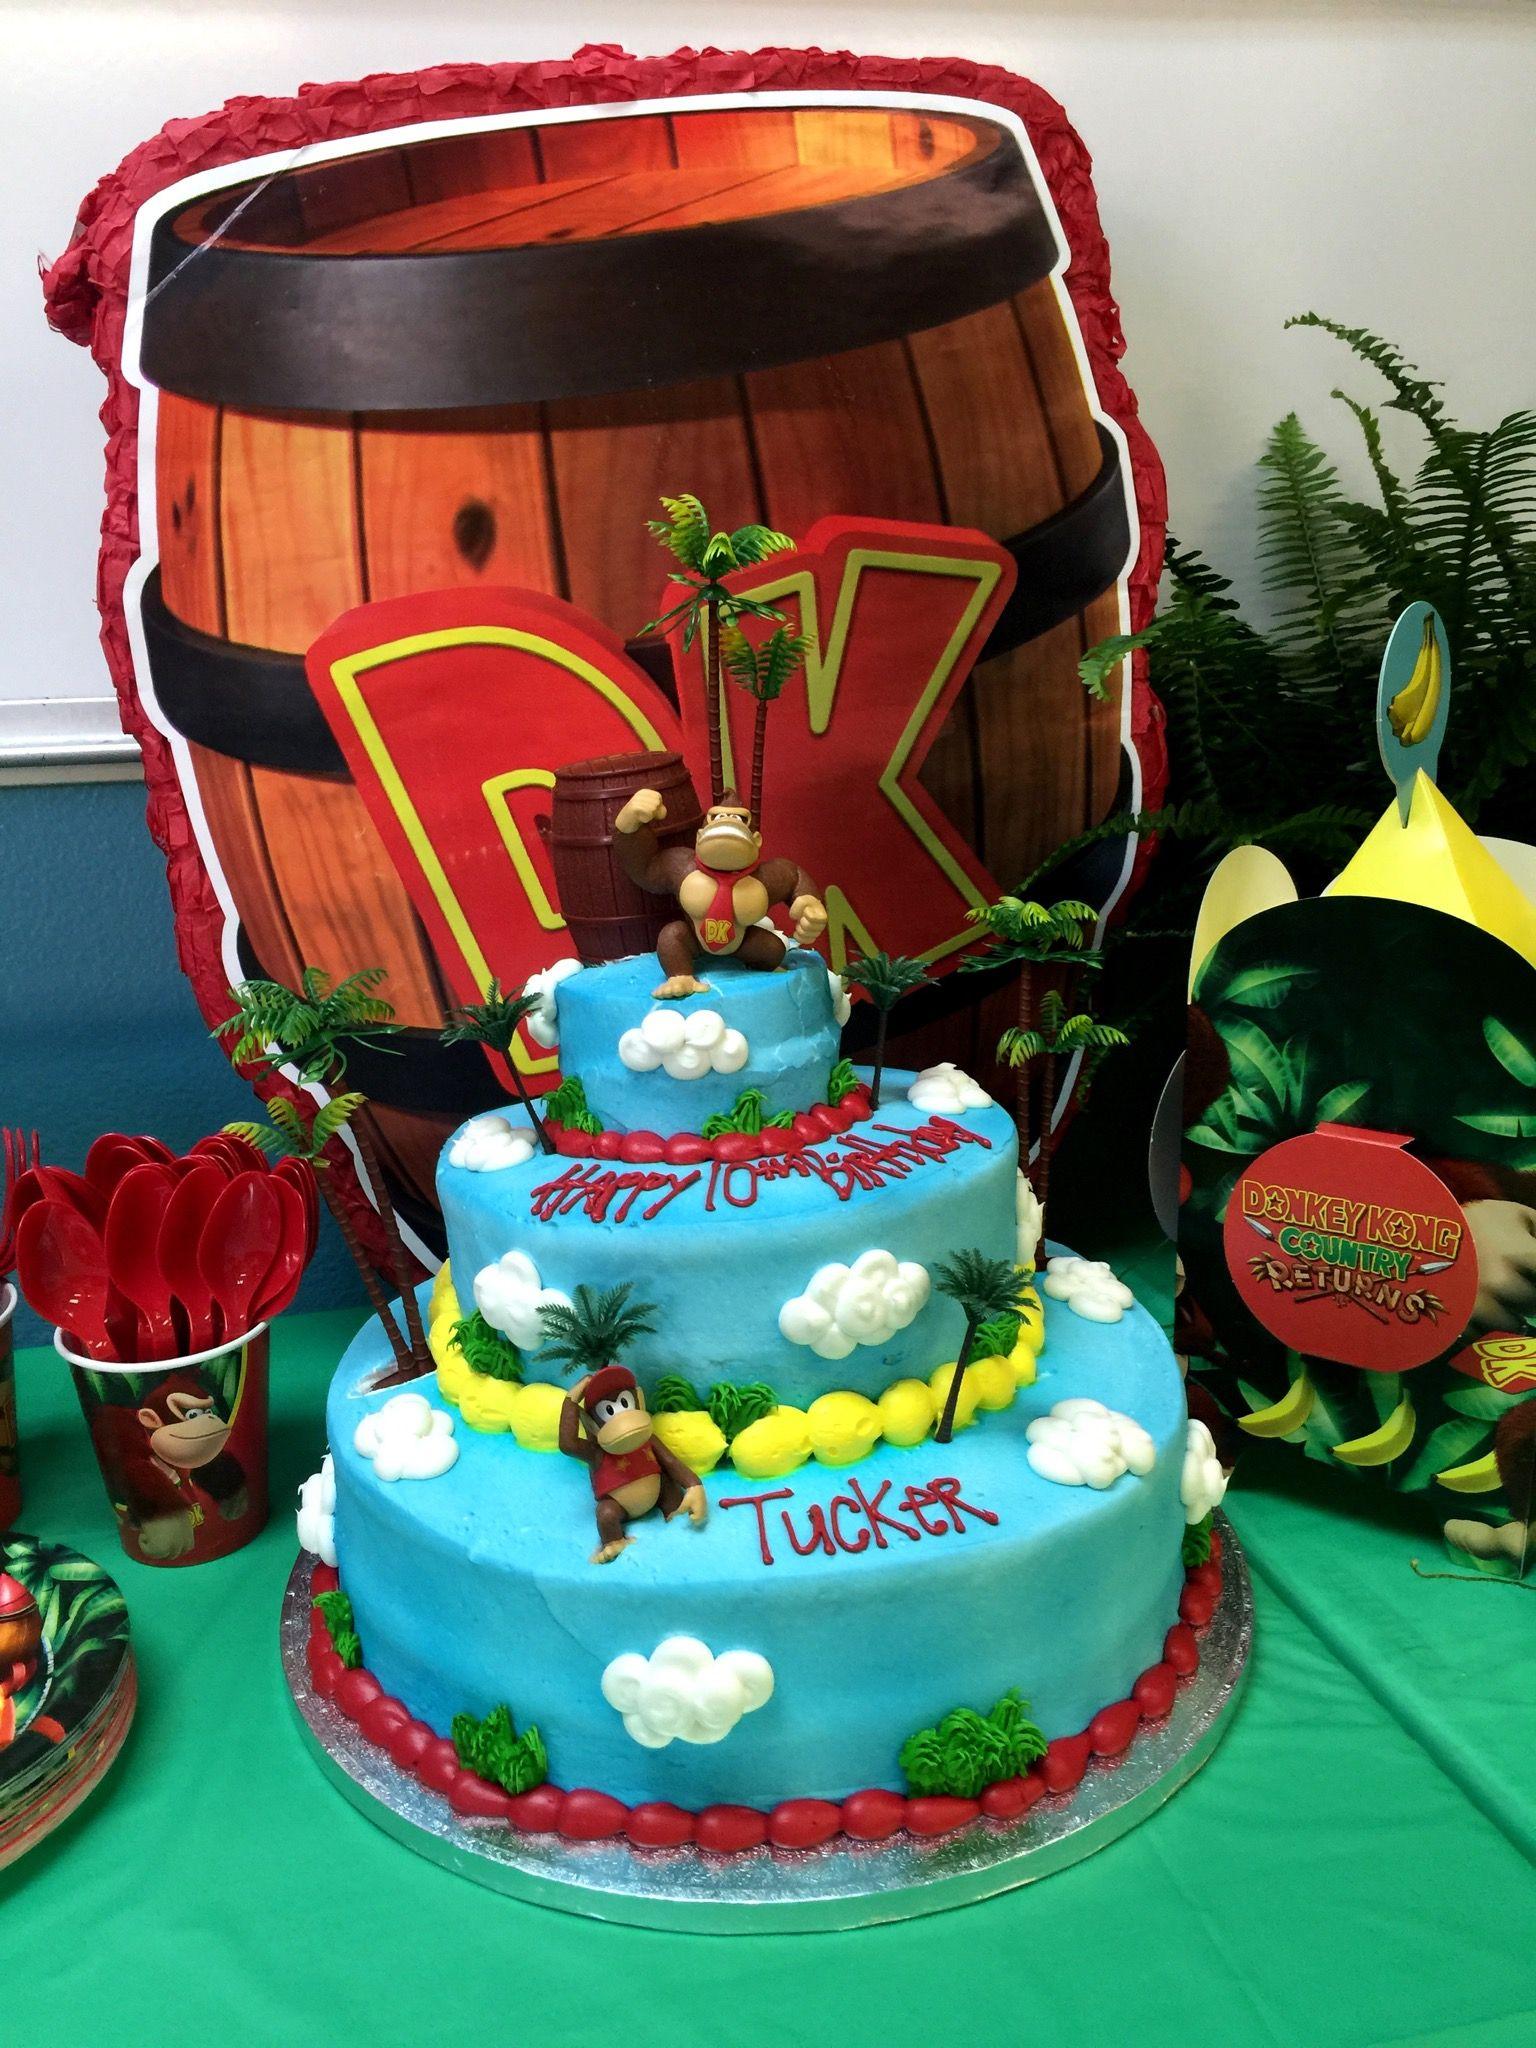 Pleasant Donkey Kong Birthday Party Cake With Images Birthday Party Funny Birthday Cards Online Amentibdeldamsfinfo